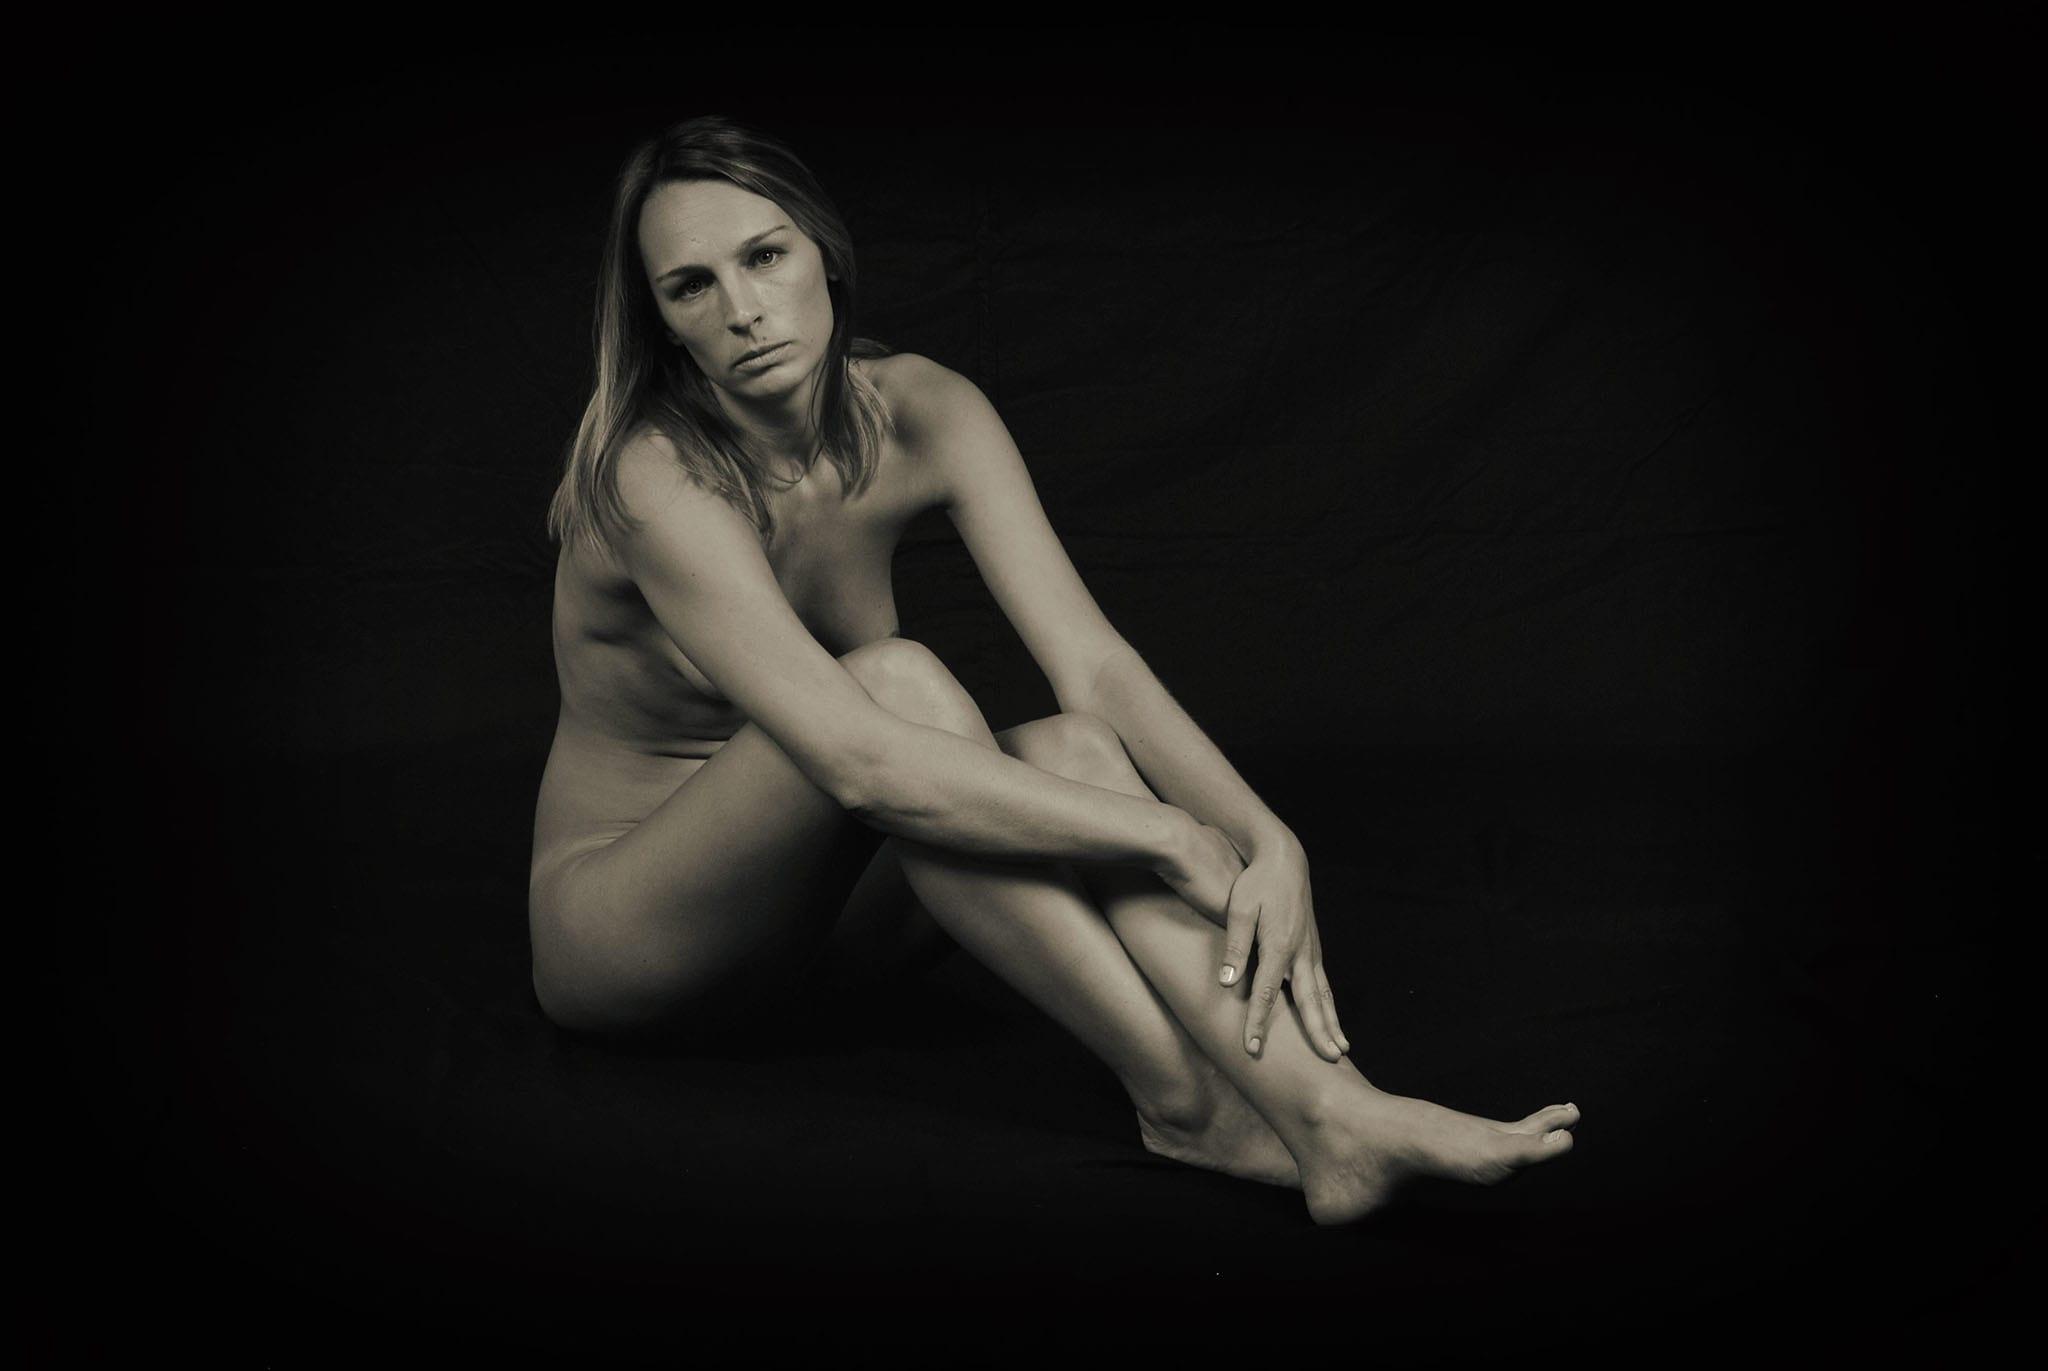 Akt 04 - Akt Nude Act Aktfotografie Erotik Erotic